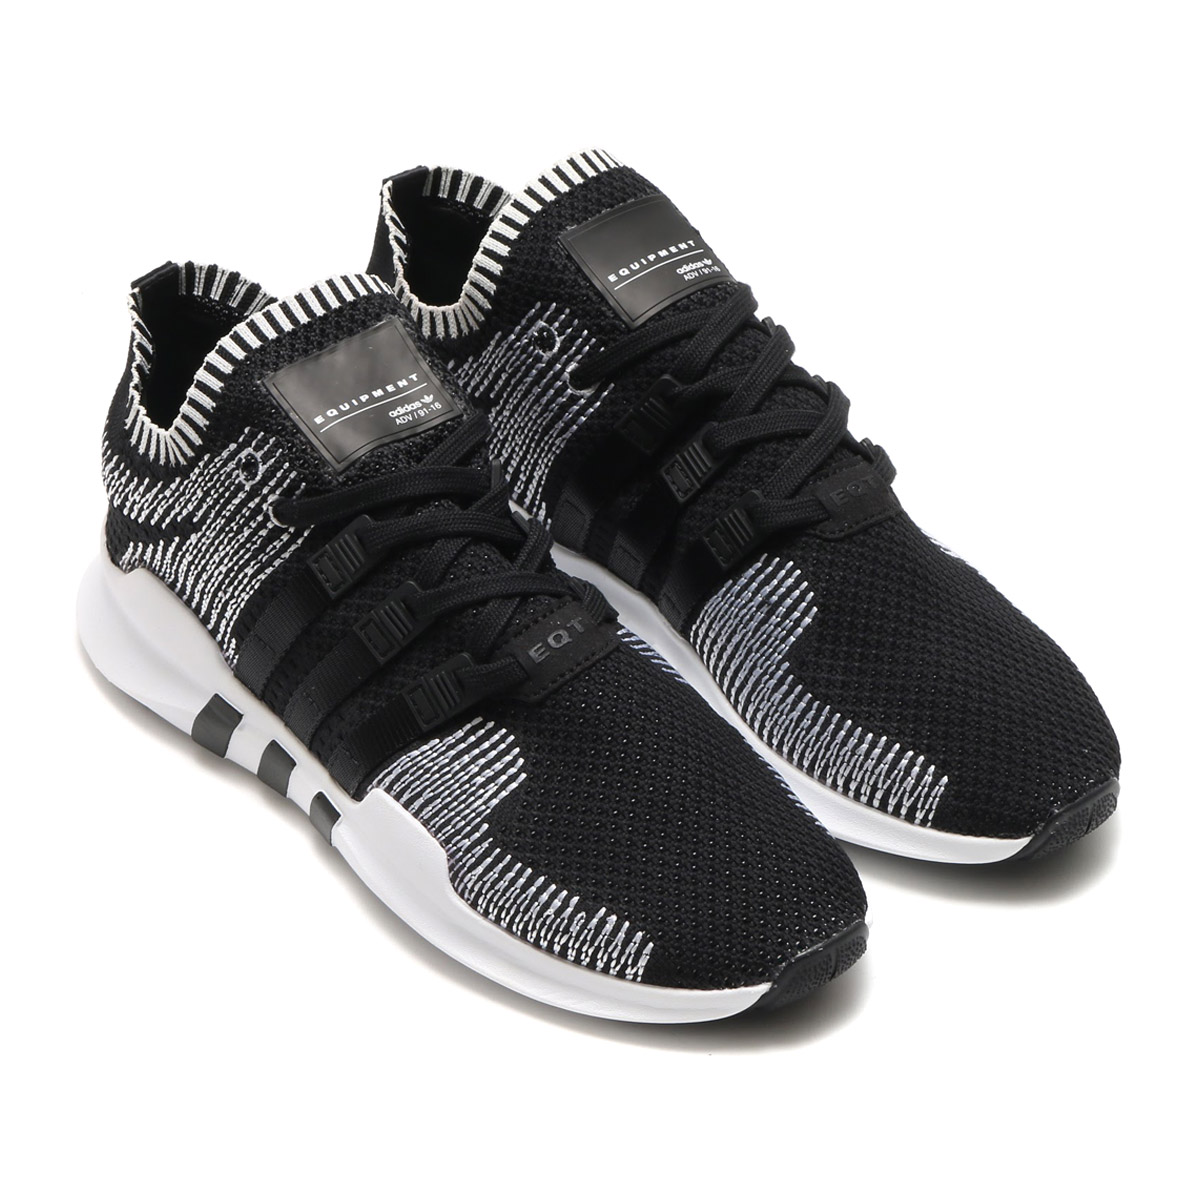 adidas Originals EQT SUPPORTADV PK(アディダス オリジナルス EQT サポートADV PK)CORE BLACK/CORE BLACK/RUNNING WHITE【メンズ スニーカー】17FW-I